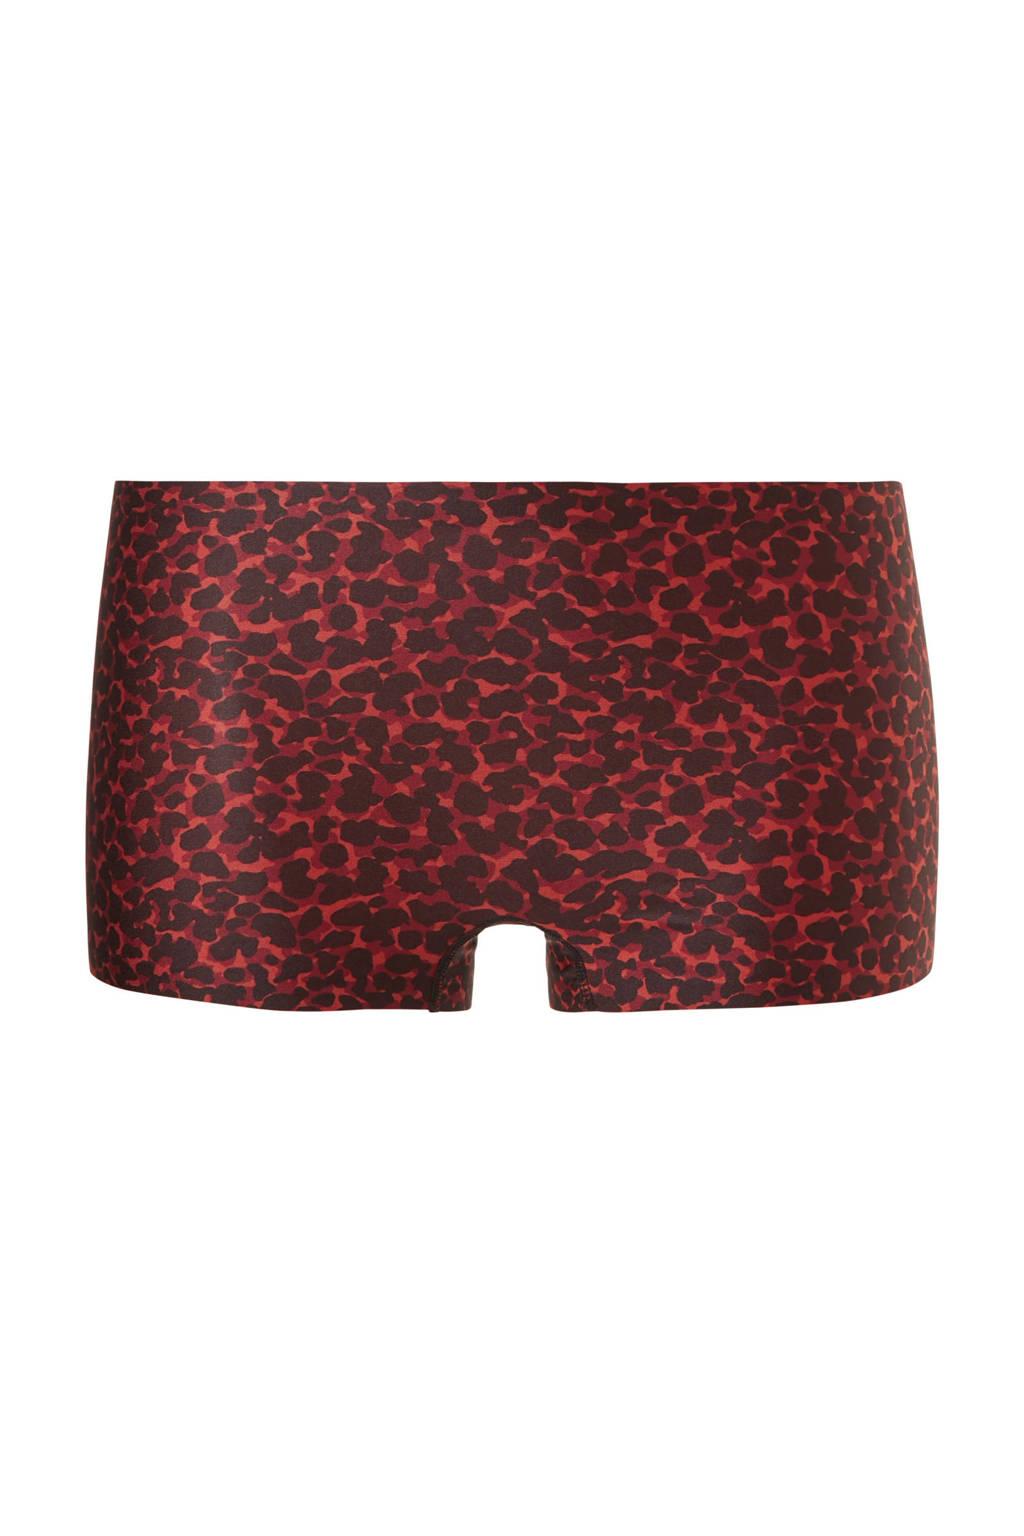 ten Cate Secrets short met panterprint rood/zwart, Rood/zwart